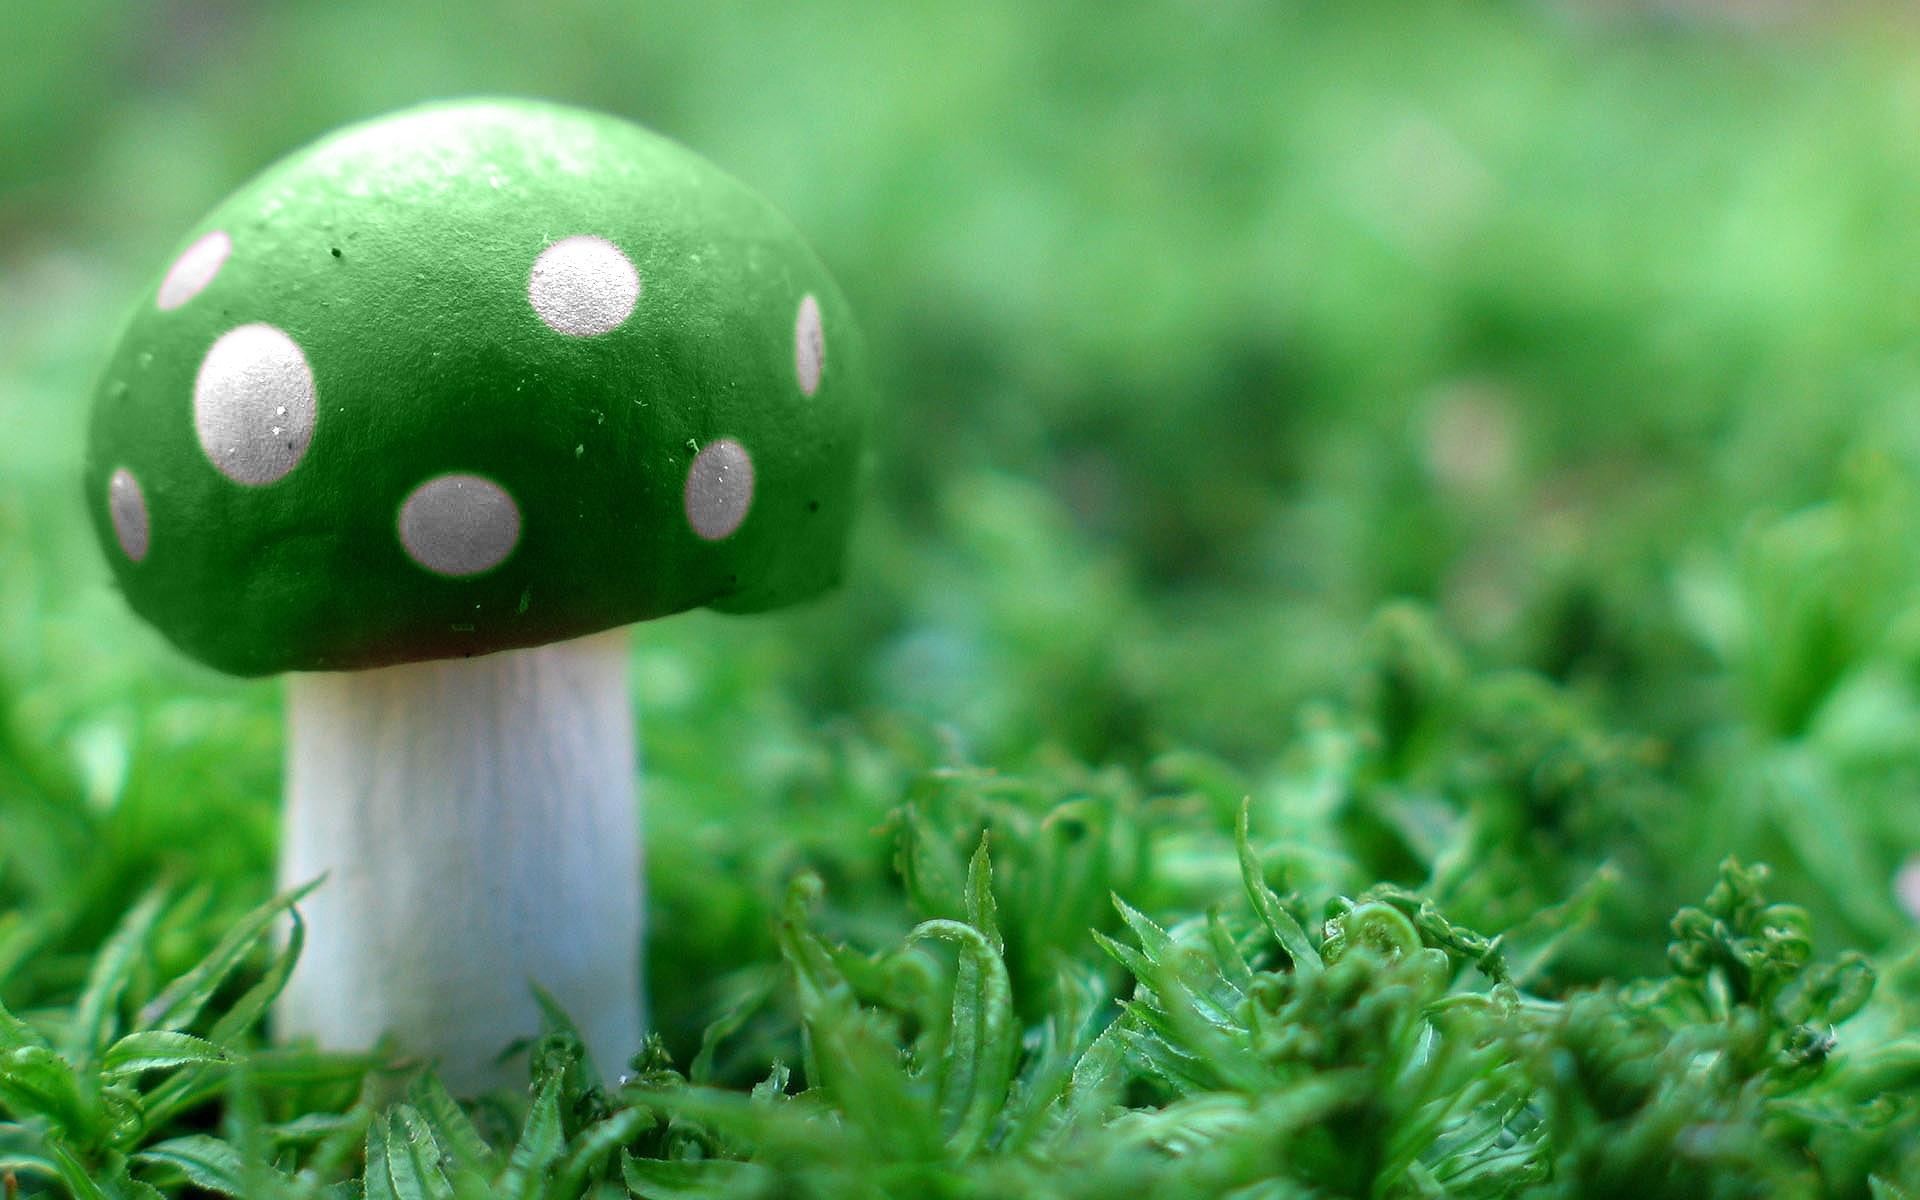 abstract wallpapers hd green mushroom